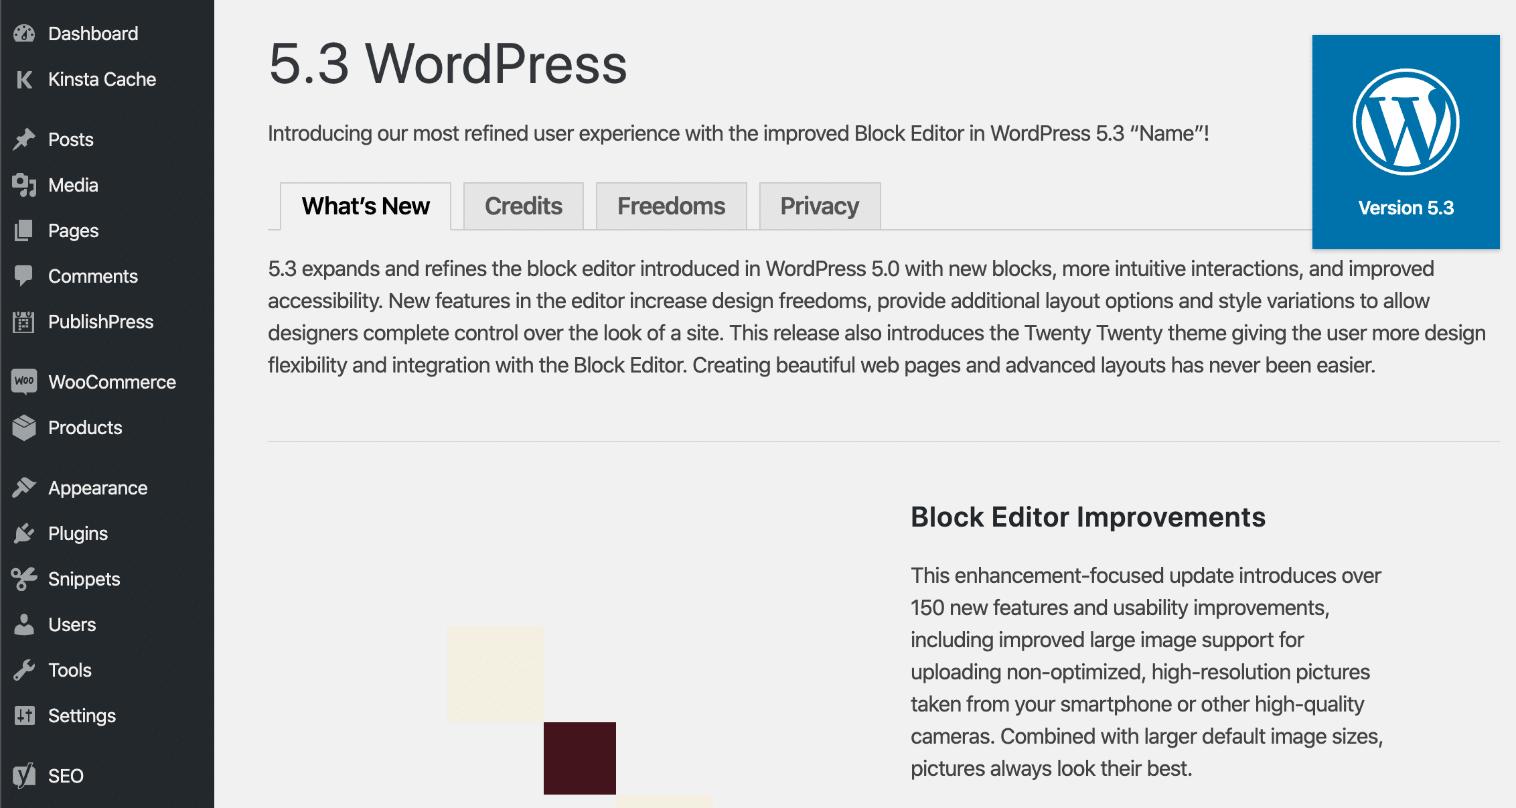 Tela de boas-vindas do WordPress 5.3